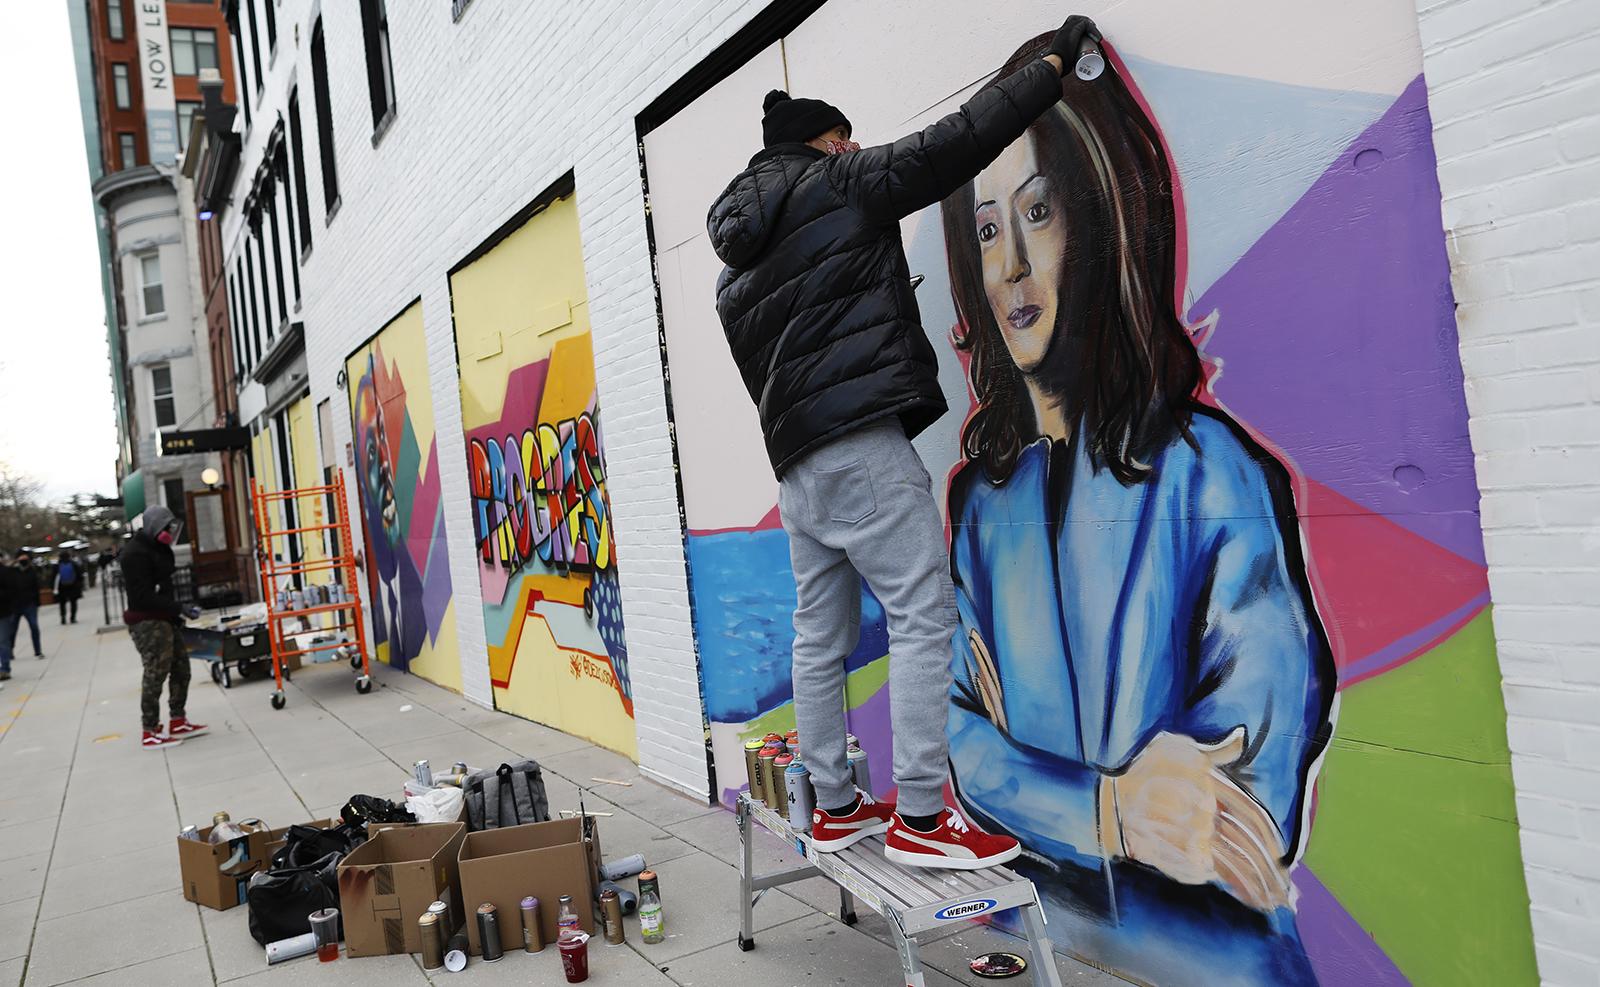 Shawn Perkins spray paints a mural of Vice President-elect Kamala Harris ahead of President-elect Joe Biden's inauguration ceremony, Monday, Jan. 18, 2021, in Washington. AP